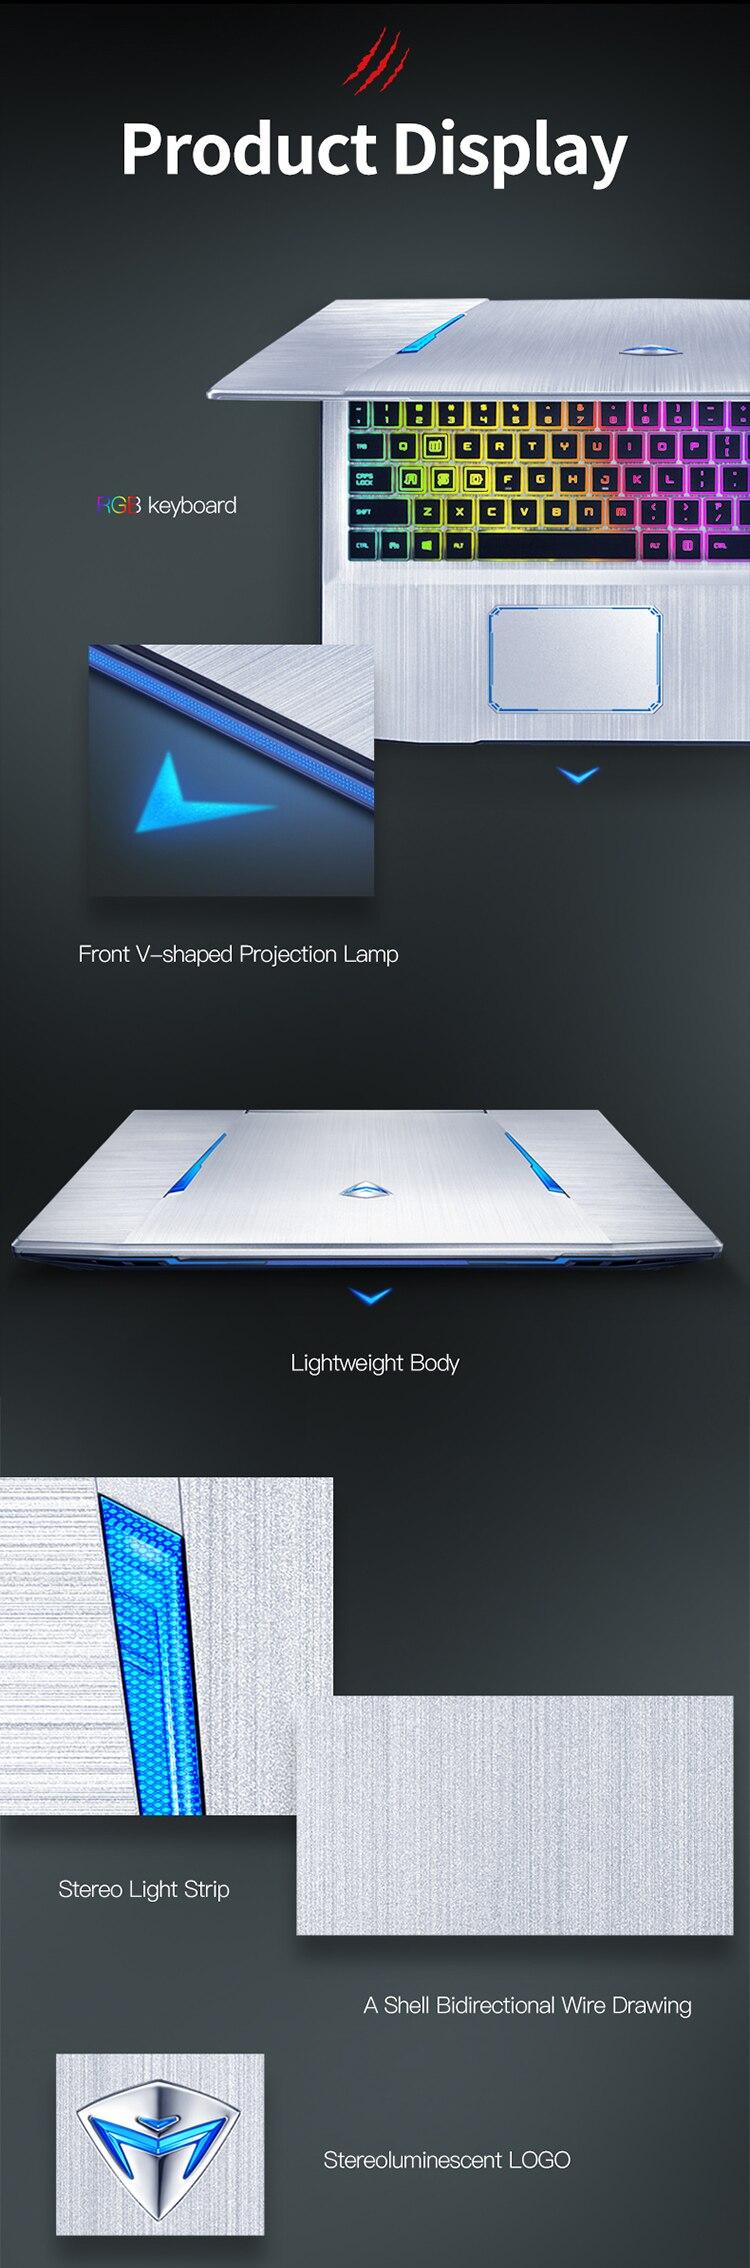 Machenike T90-T6C Gaming Laptop (Intel Core i7-8750H+GTX 1060 6G/8GB RAM/256G SSD/15.6'' 144Hz72%NTSC) Machenike-brande notebook